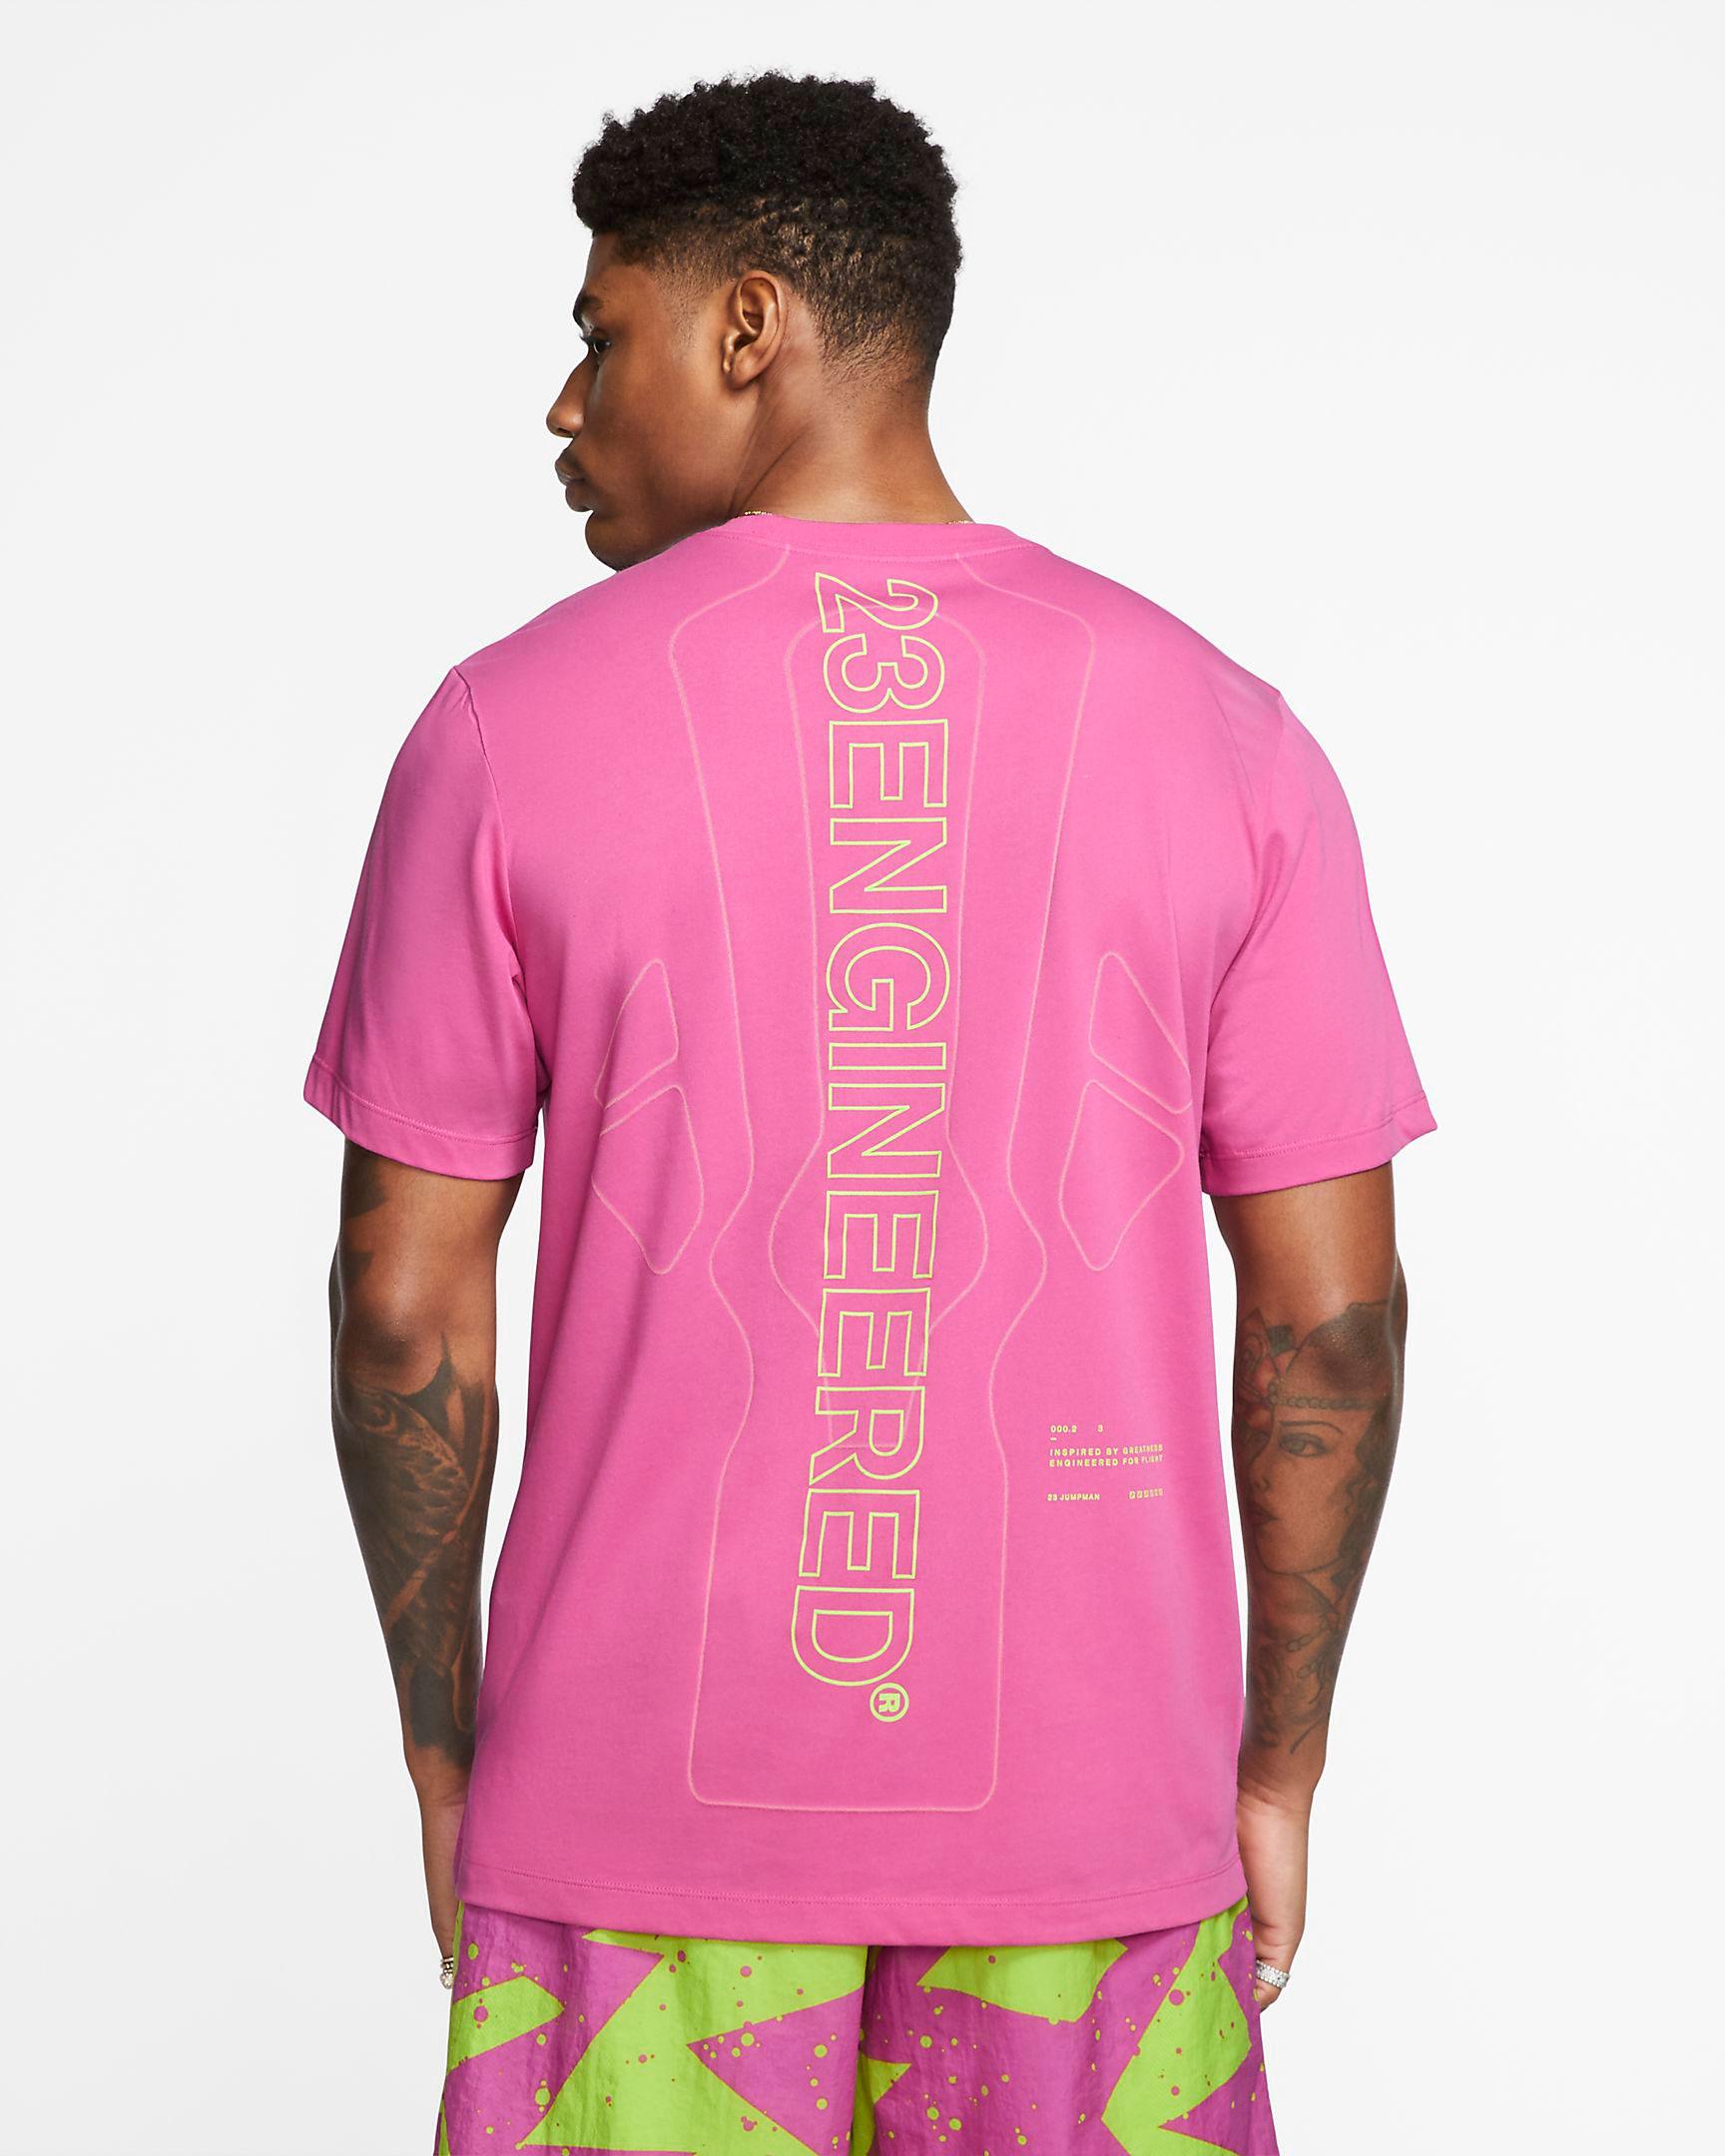 jordan-5-bel-air-2020-pink-shirt-match-2